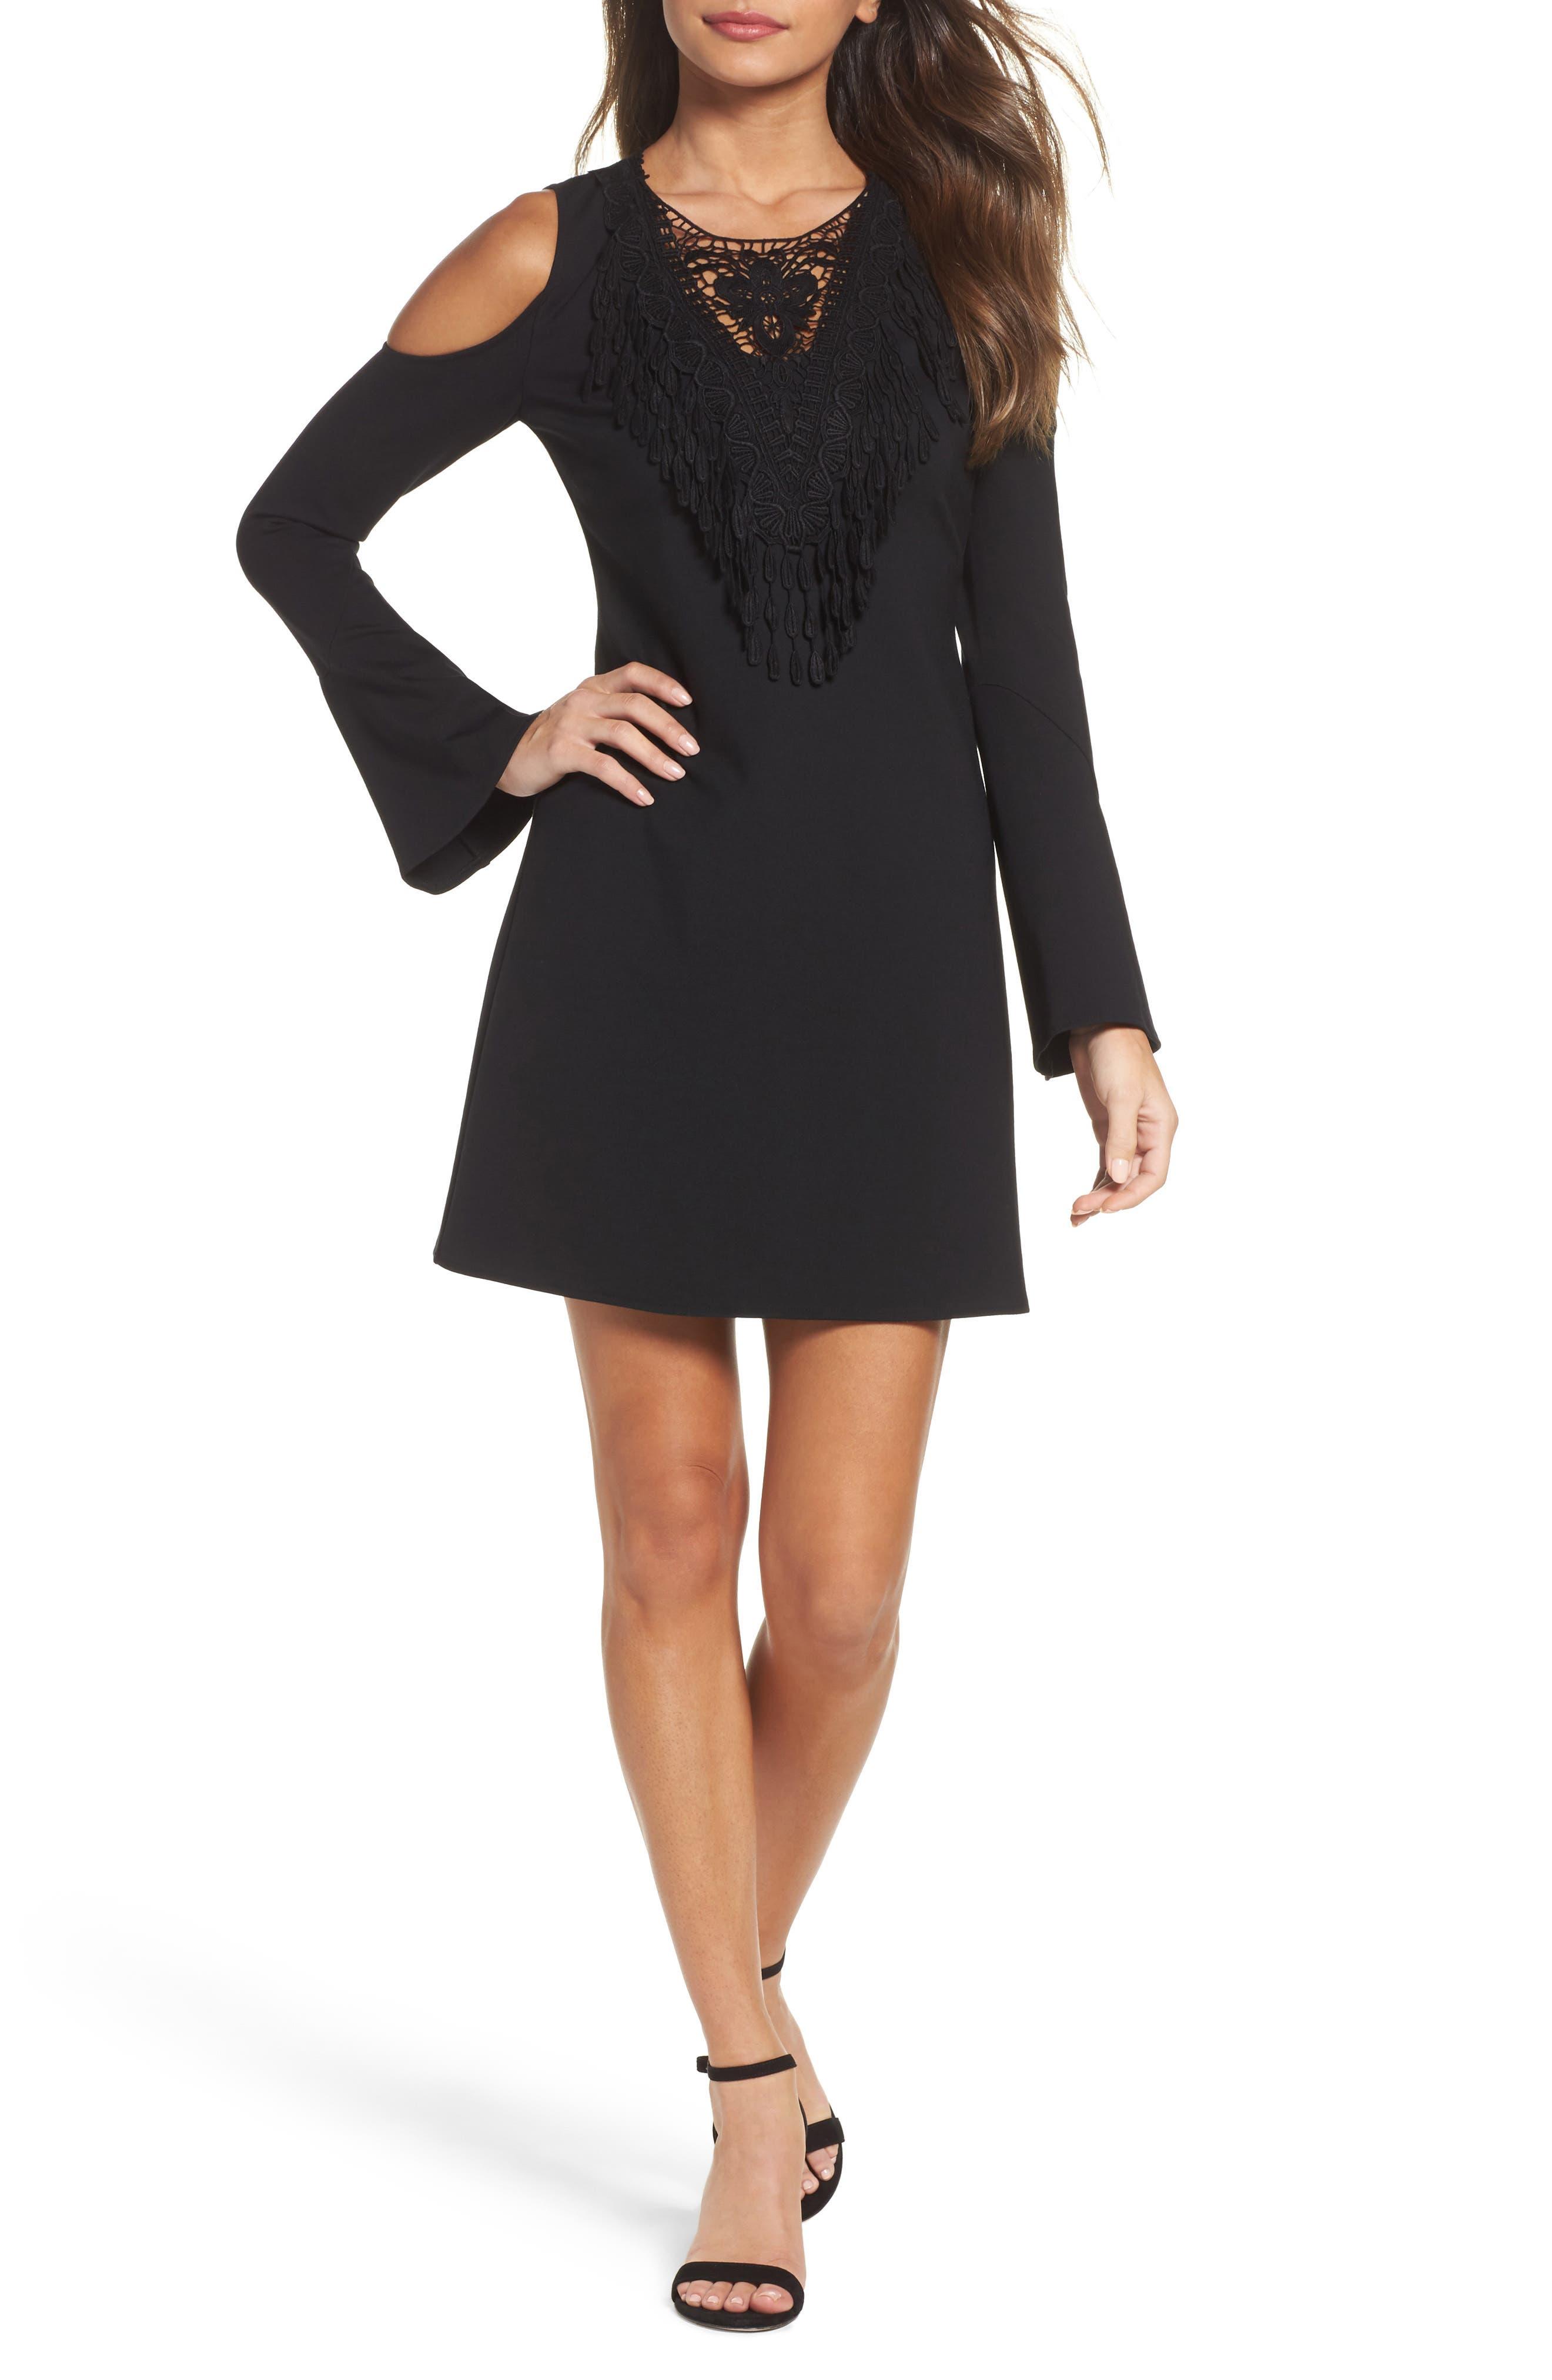 C m black dress nordstrom